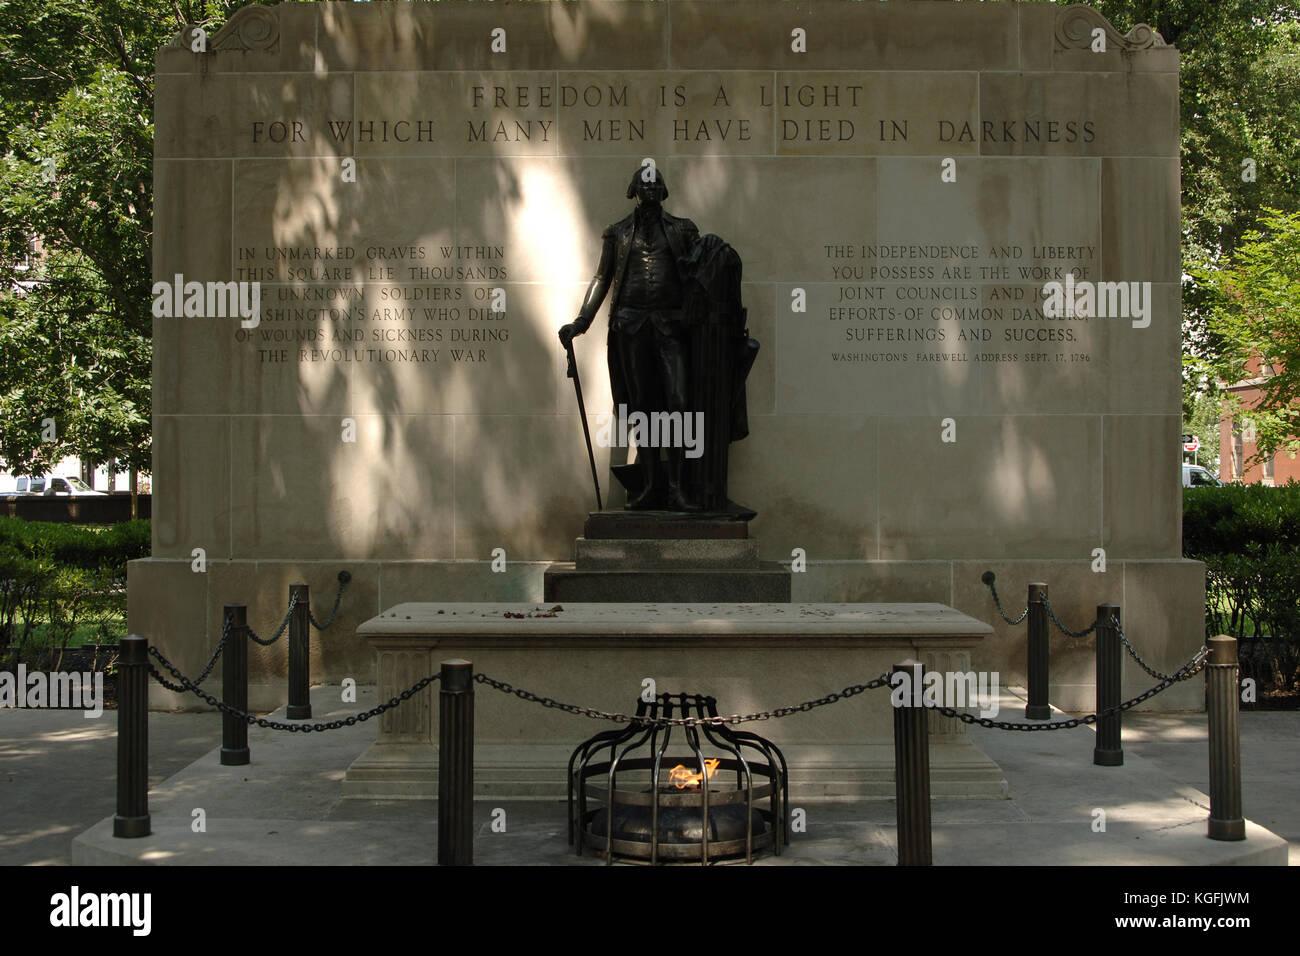 Vereinigten Staaten. Pennsylvania Philadelphia. Grab des Unbekannten revolutionären Krieg Soldat, 1957. Durch Stockbild